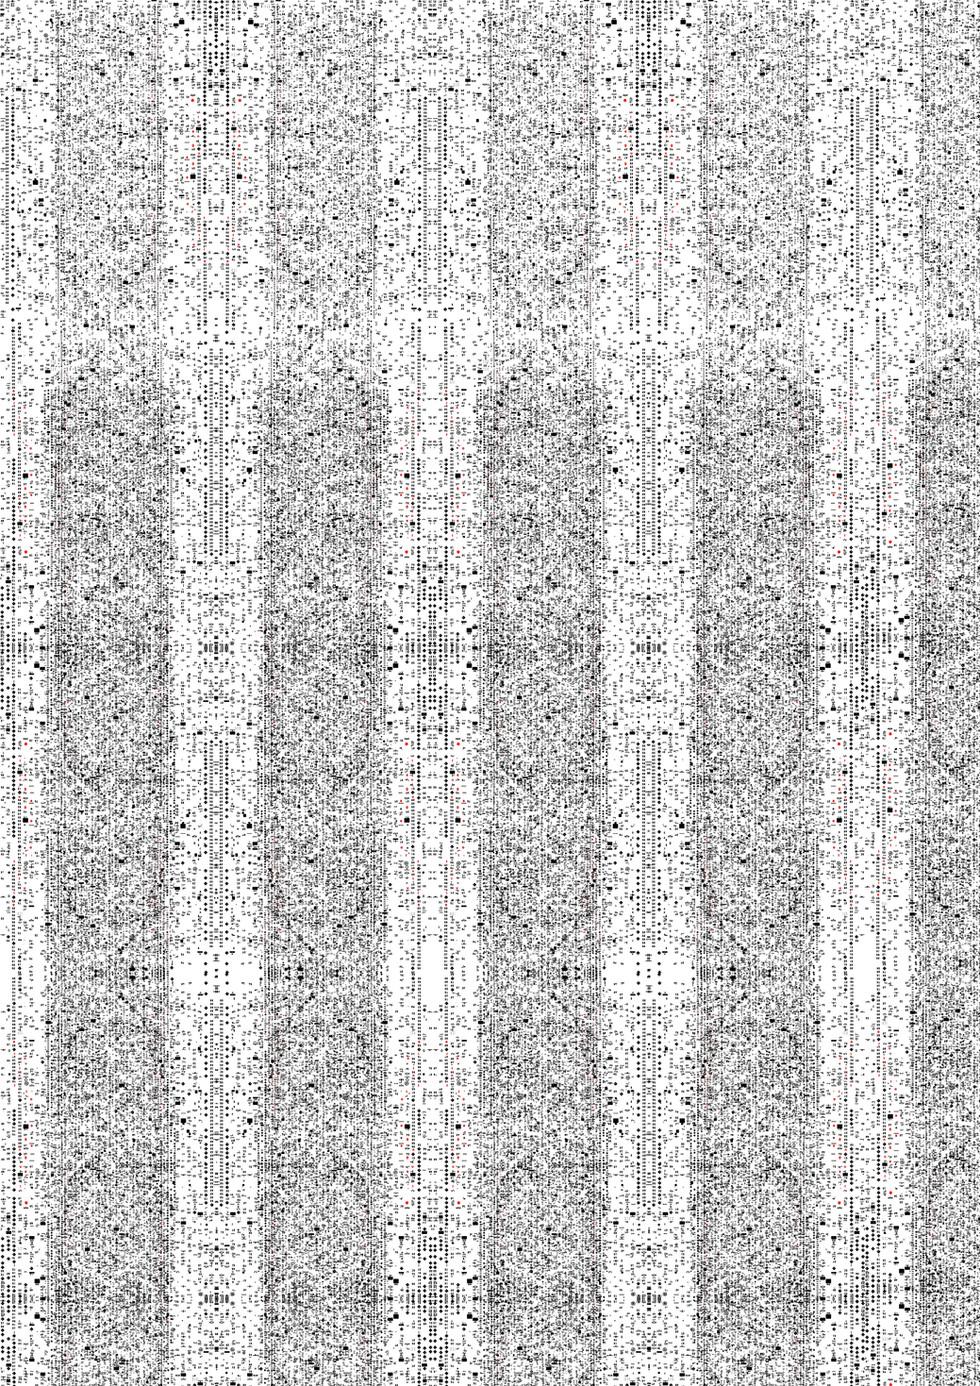 A2_PRINT_1-min.jpg